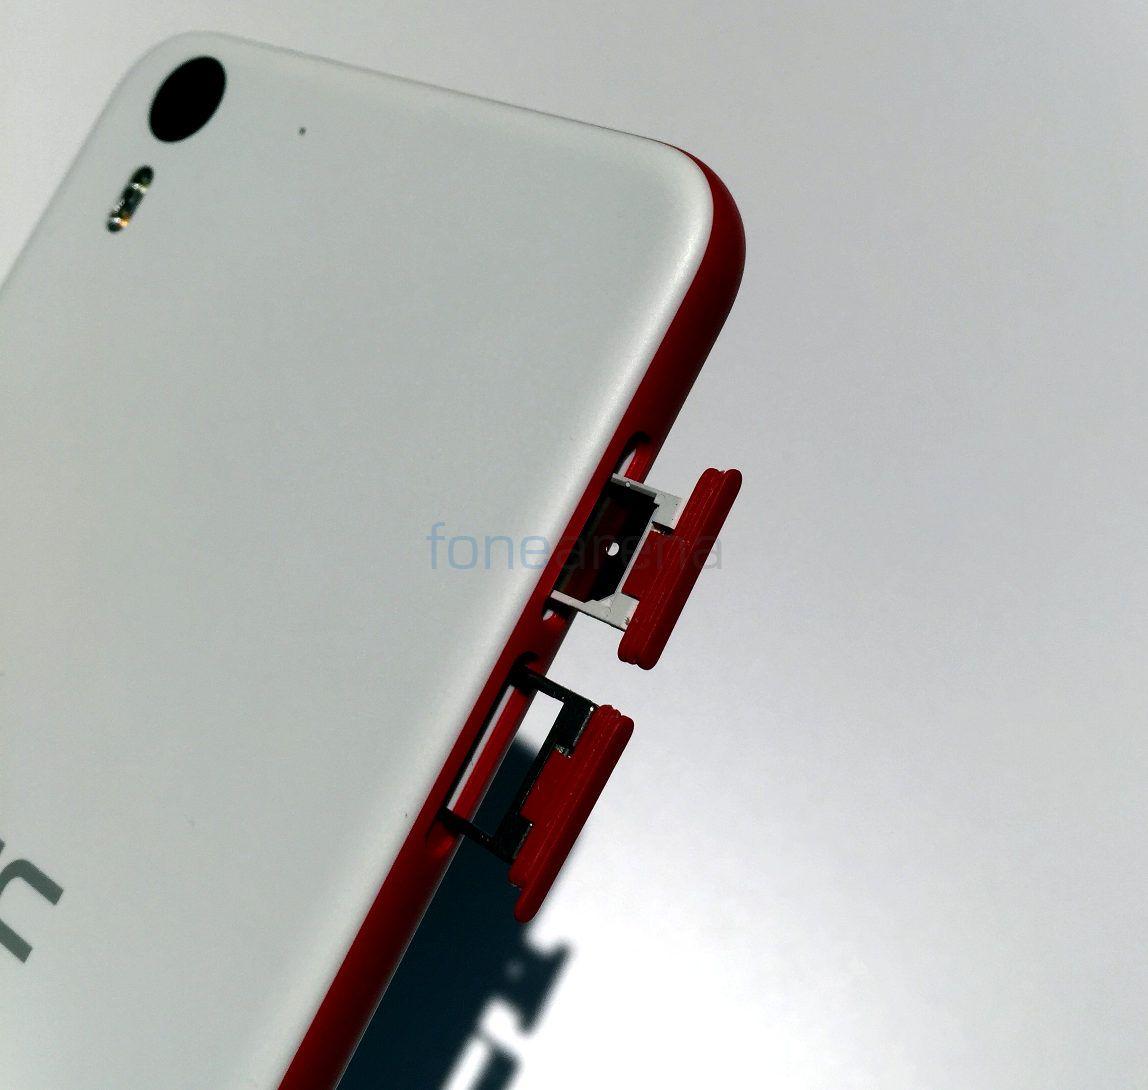 HTC Desire EYE Photo Gallery